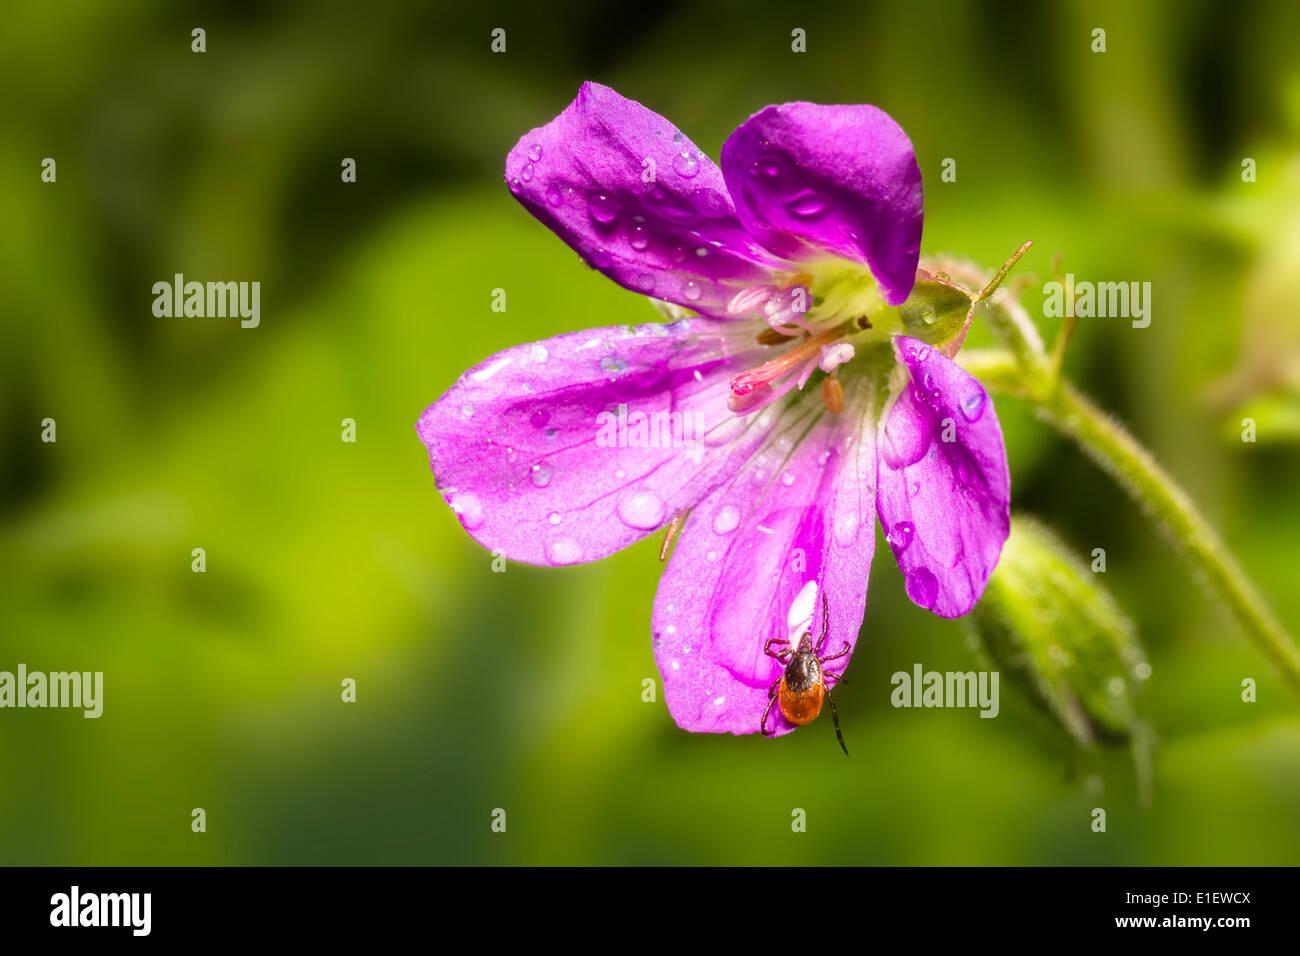 Die Rizinuspflanze Zecke (Ixodes Ricinus) Stockfoto